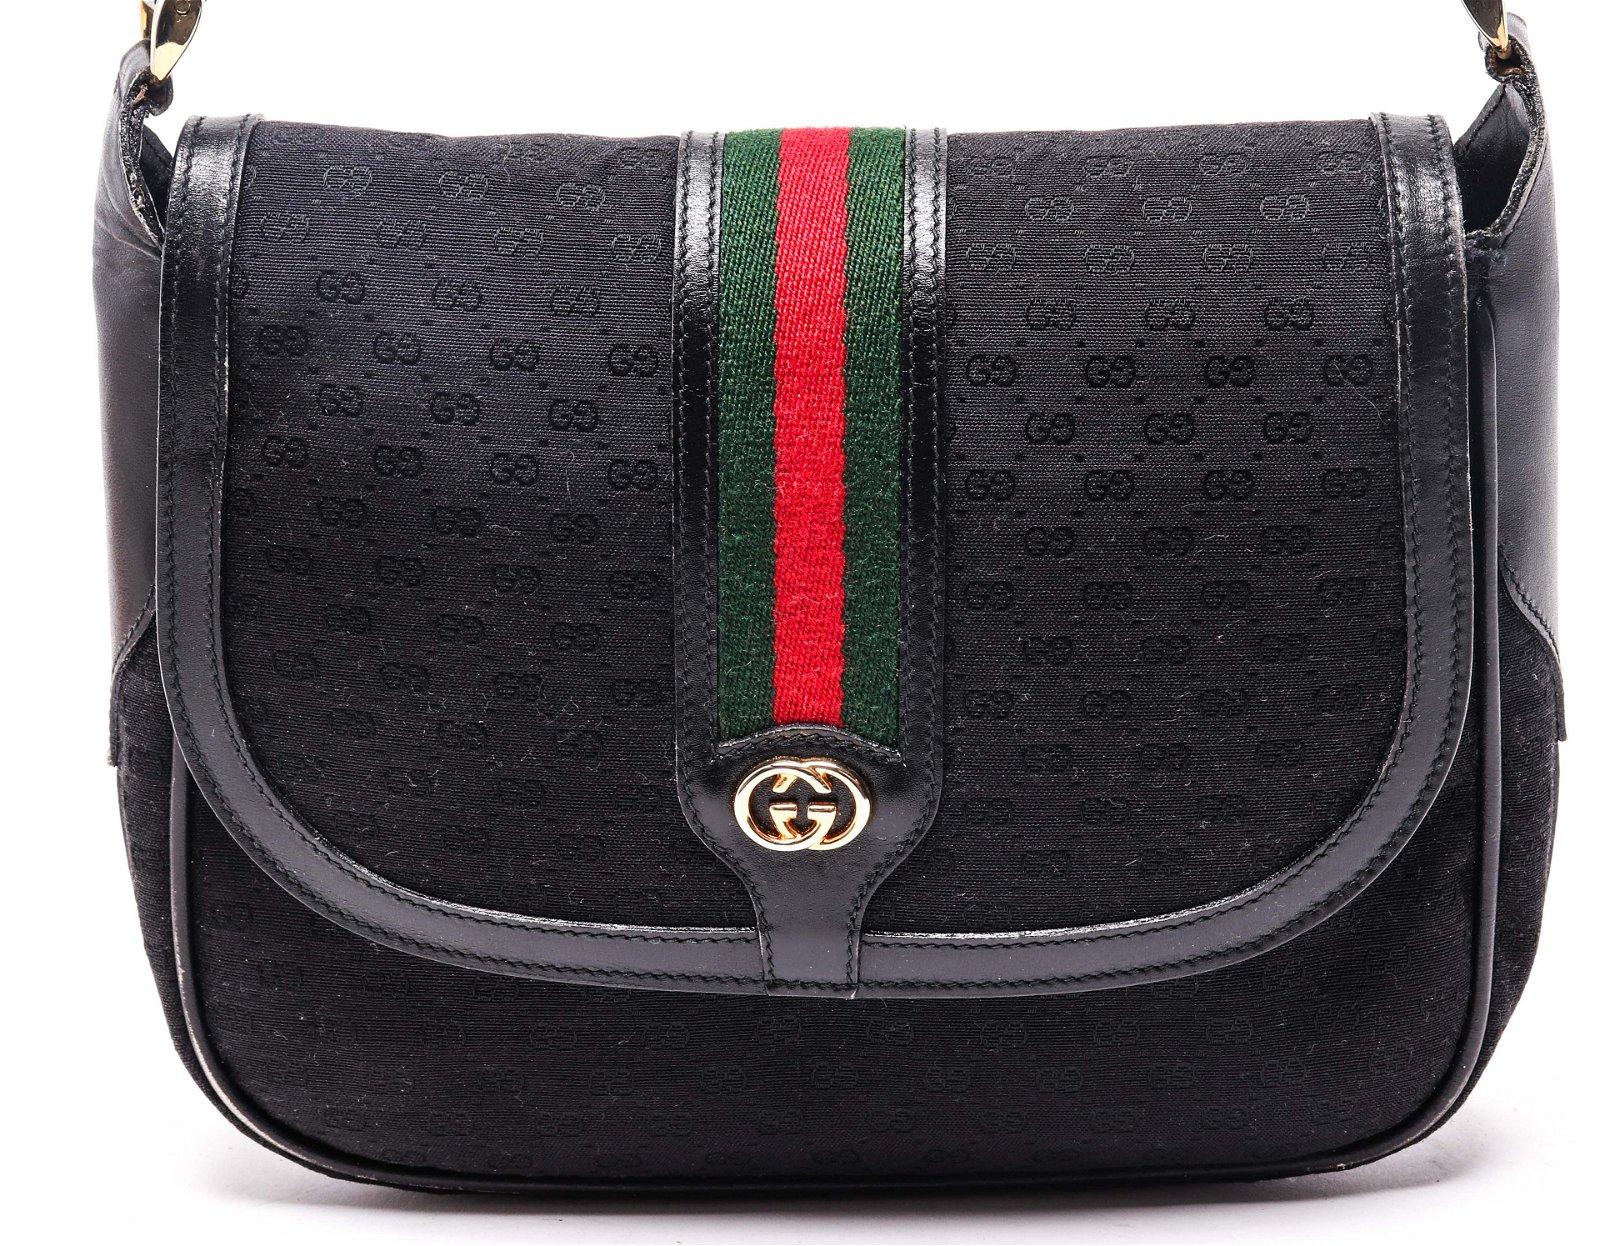 Gucci Black Monogram Canvas & Leather Handbag